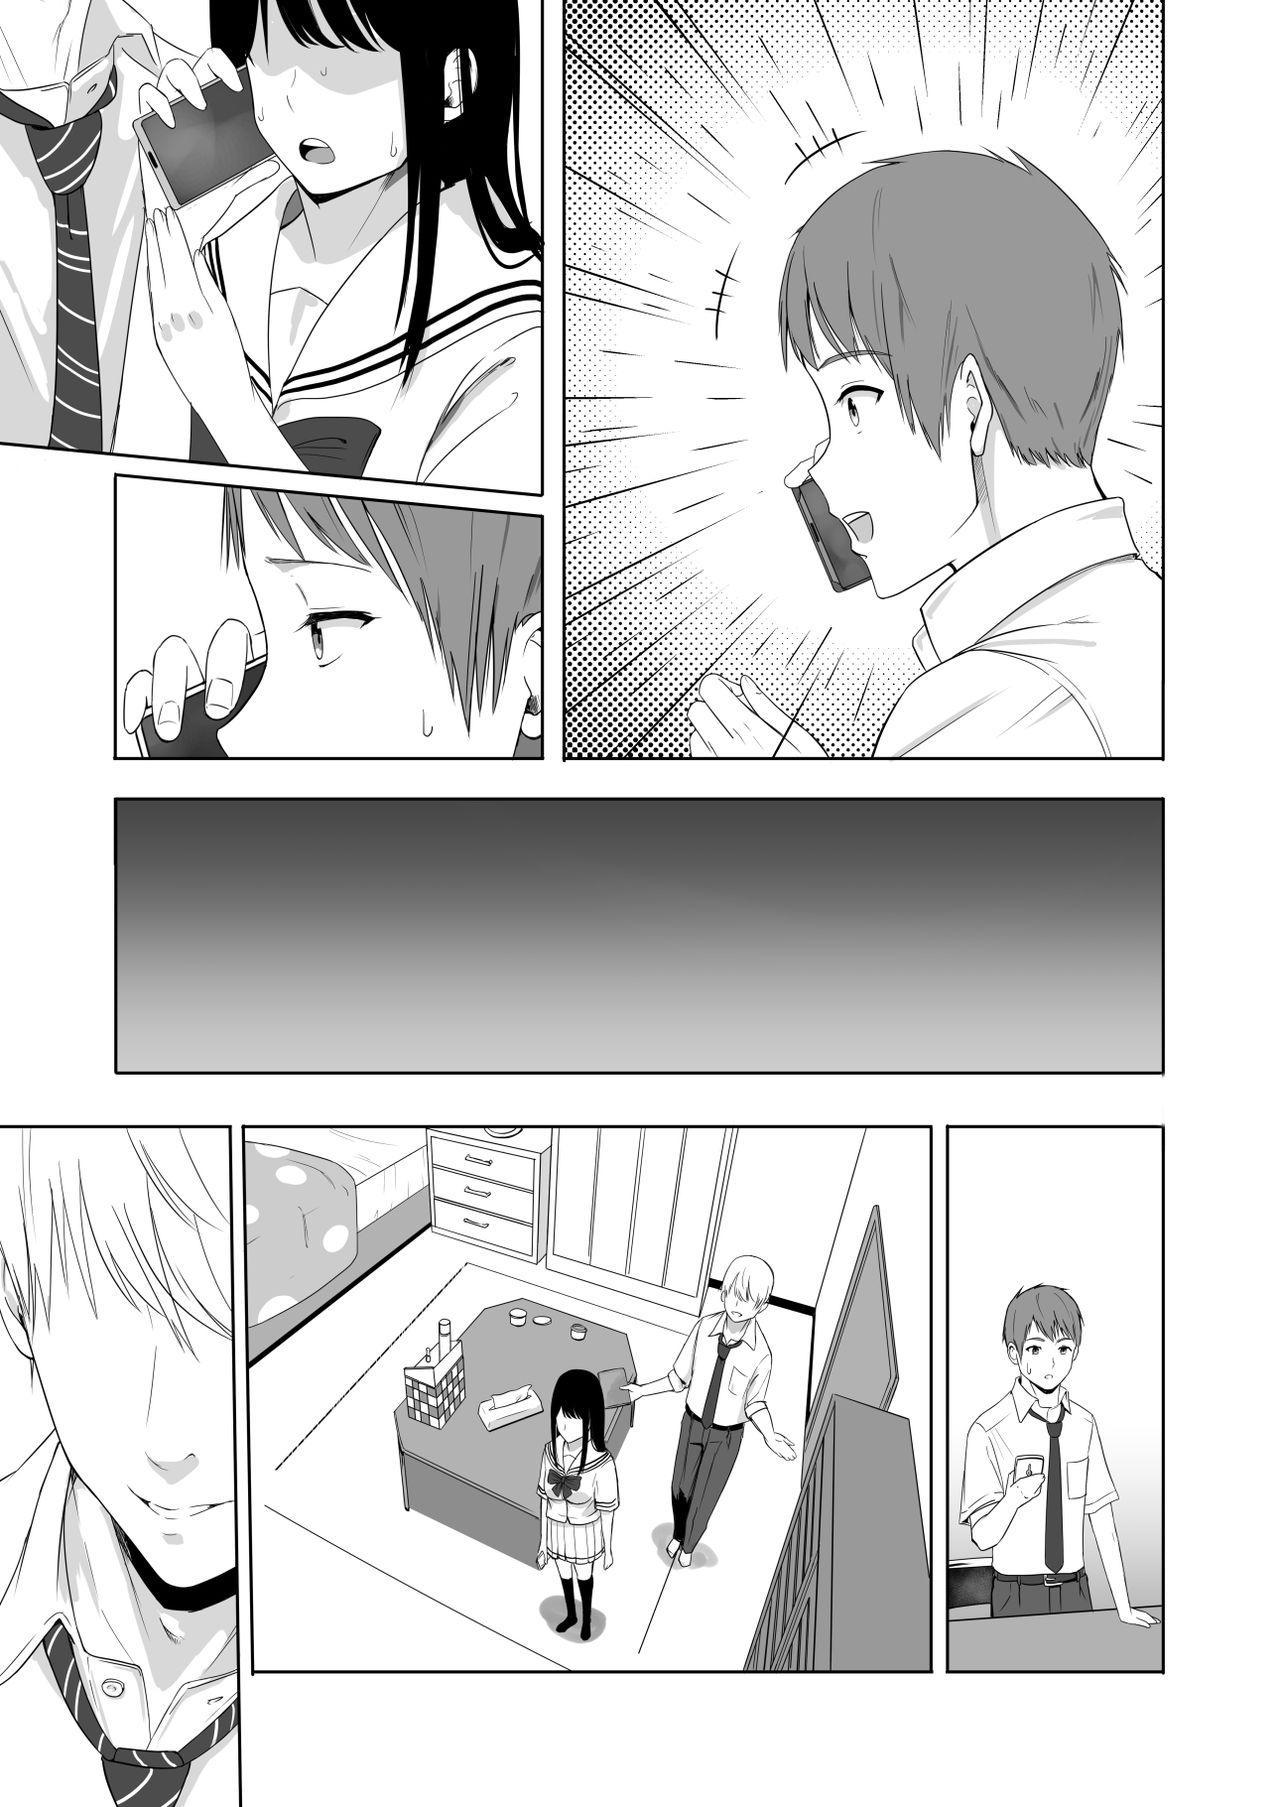 Kimi ga Tame. 2 Ichikawa Inori 129